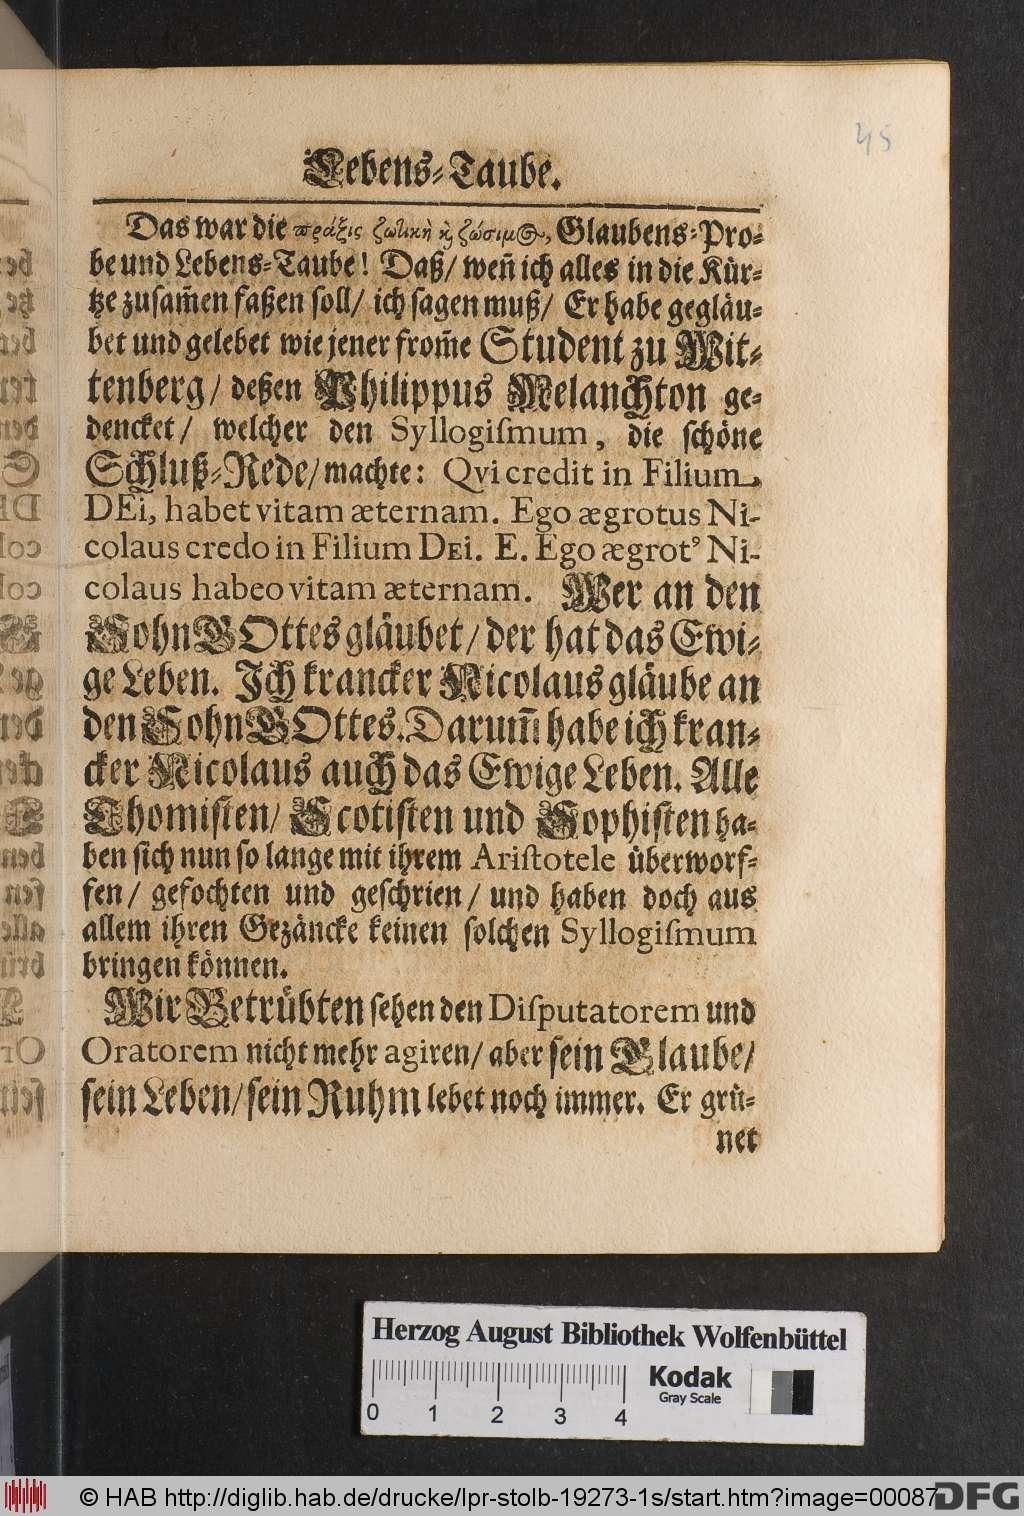 http://diglib.hab.de/drucke/lpr-stolb-19273-1s/00087.jpg